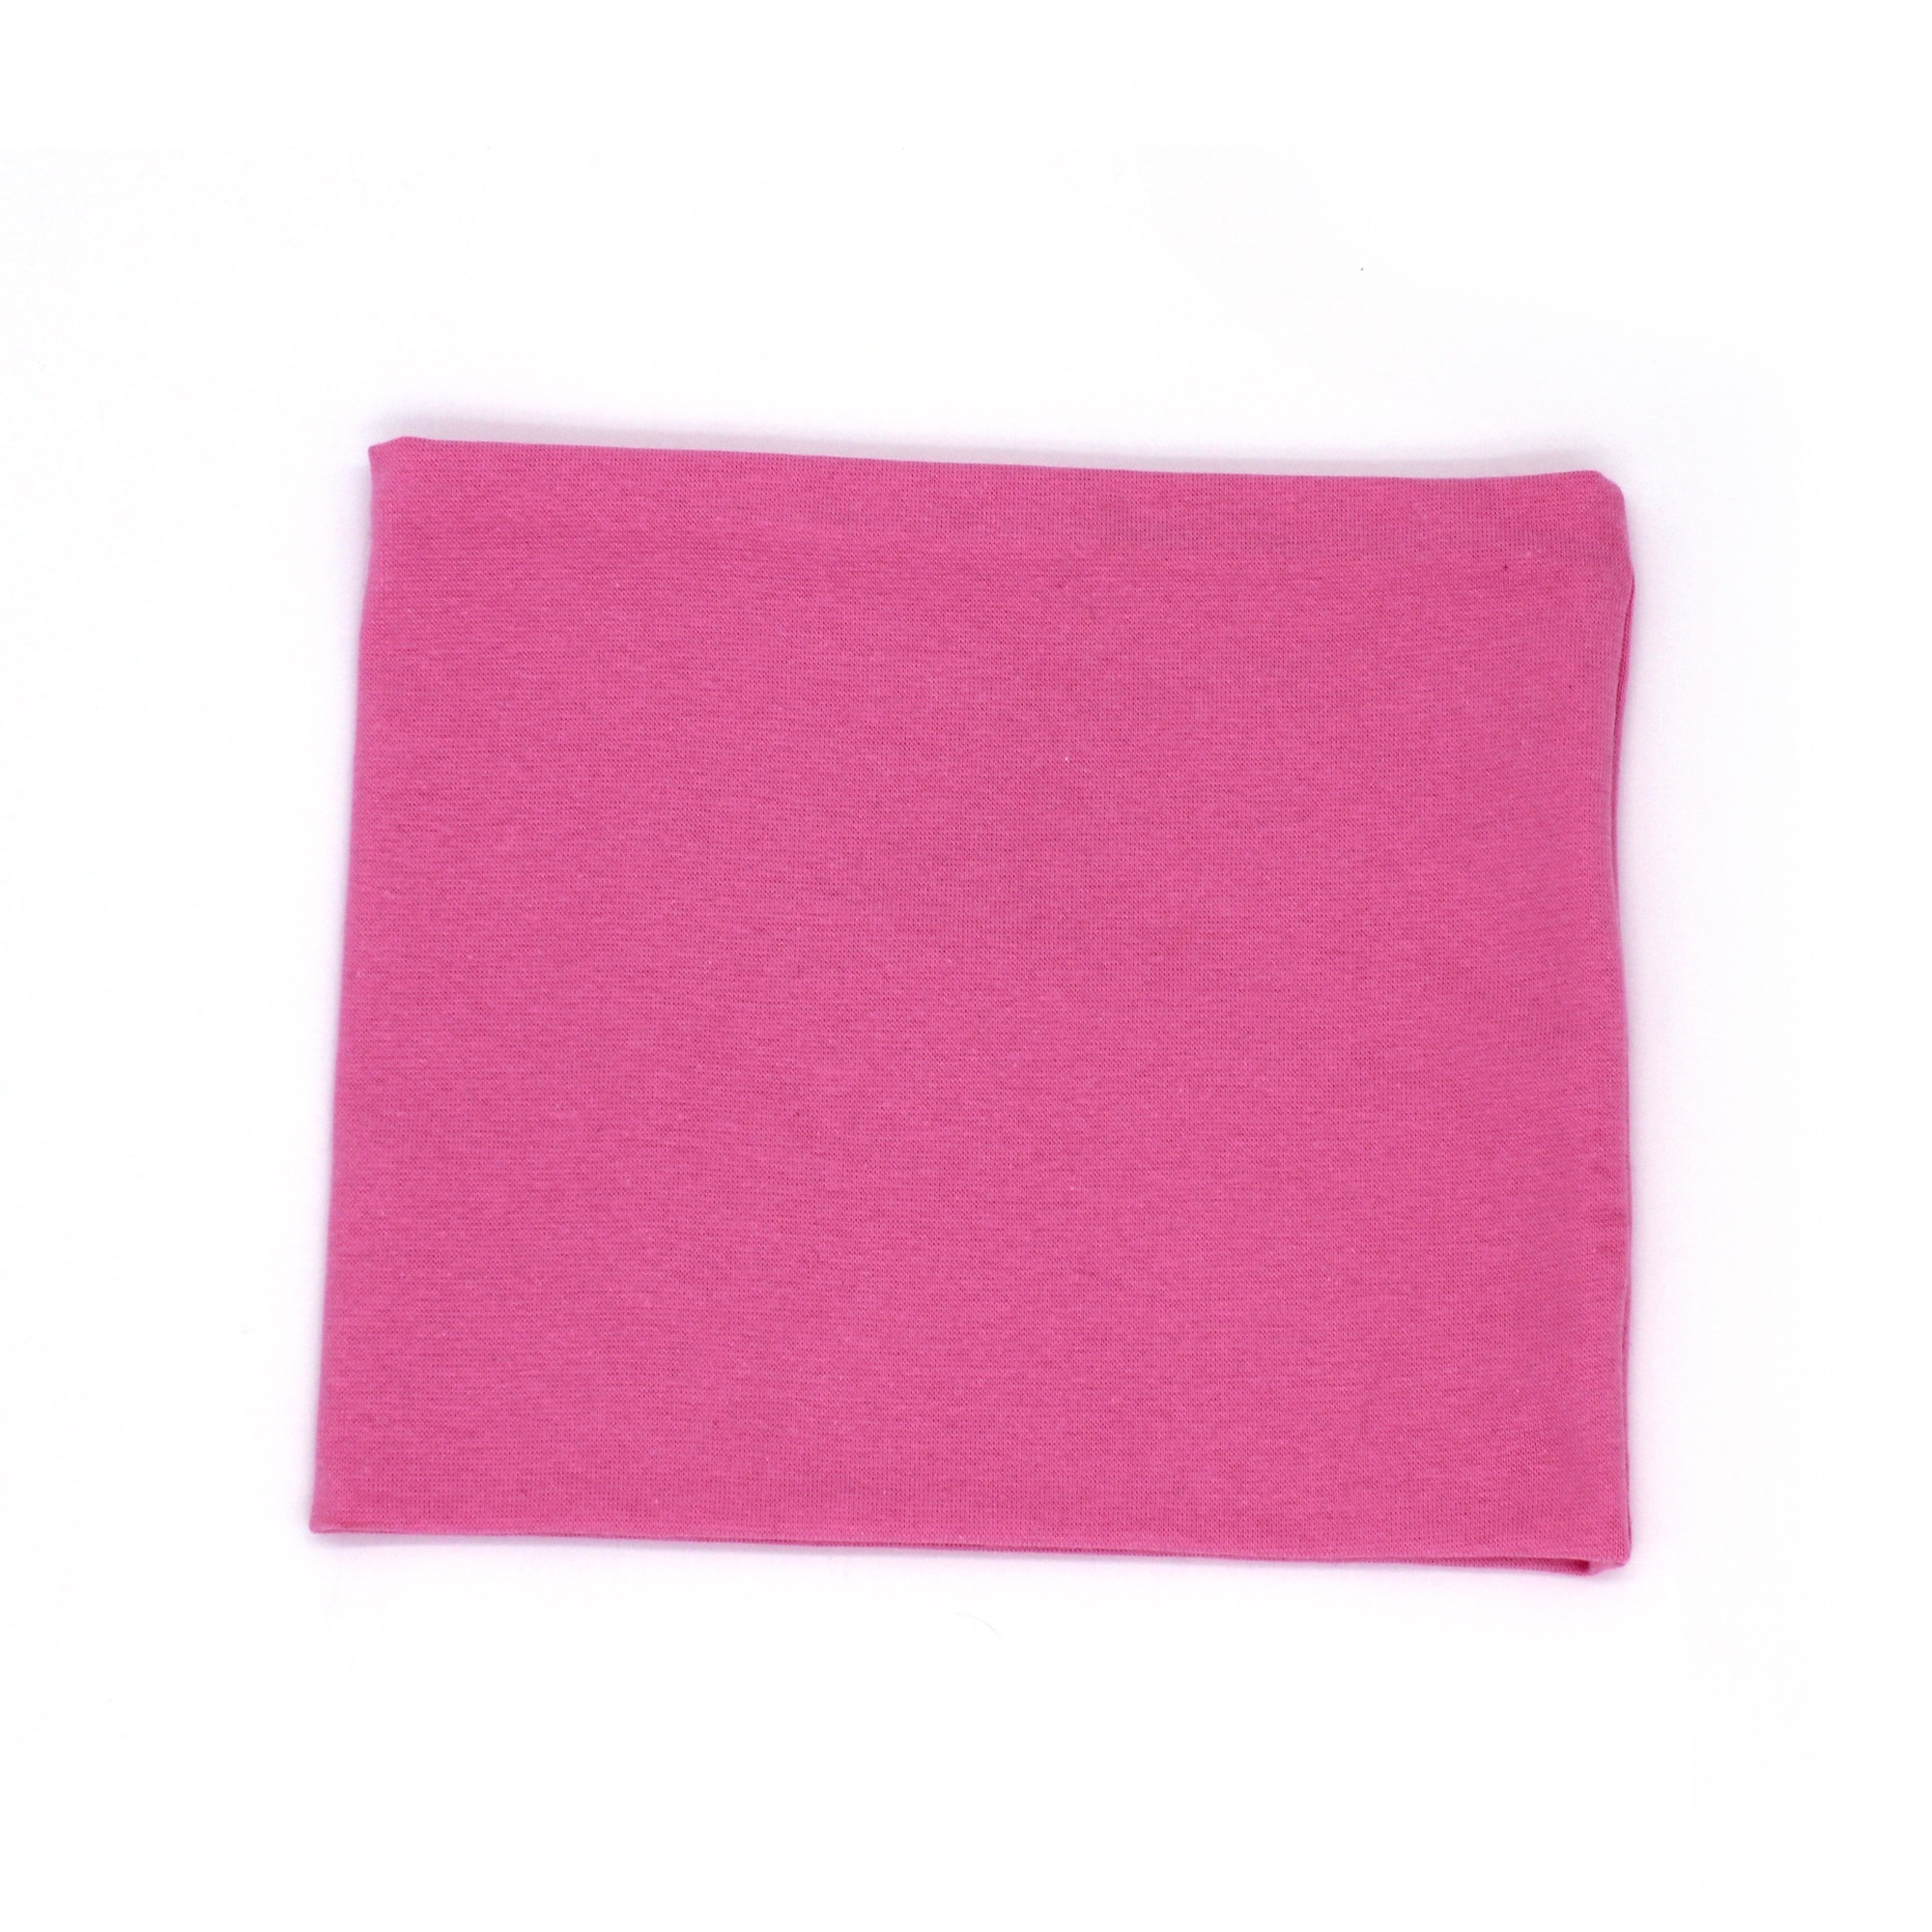 Шарф Nais, цвет: розовый р.52-54 ДС.Снуд (розовый яркий)